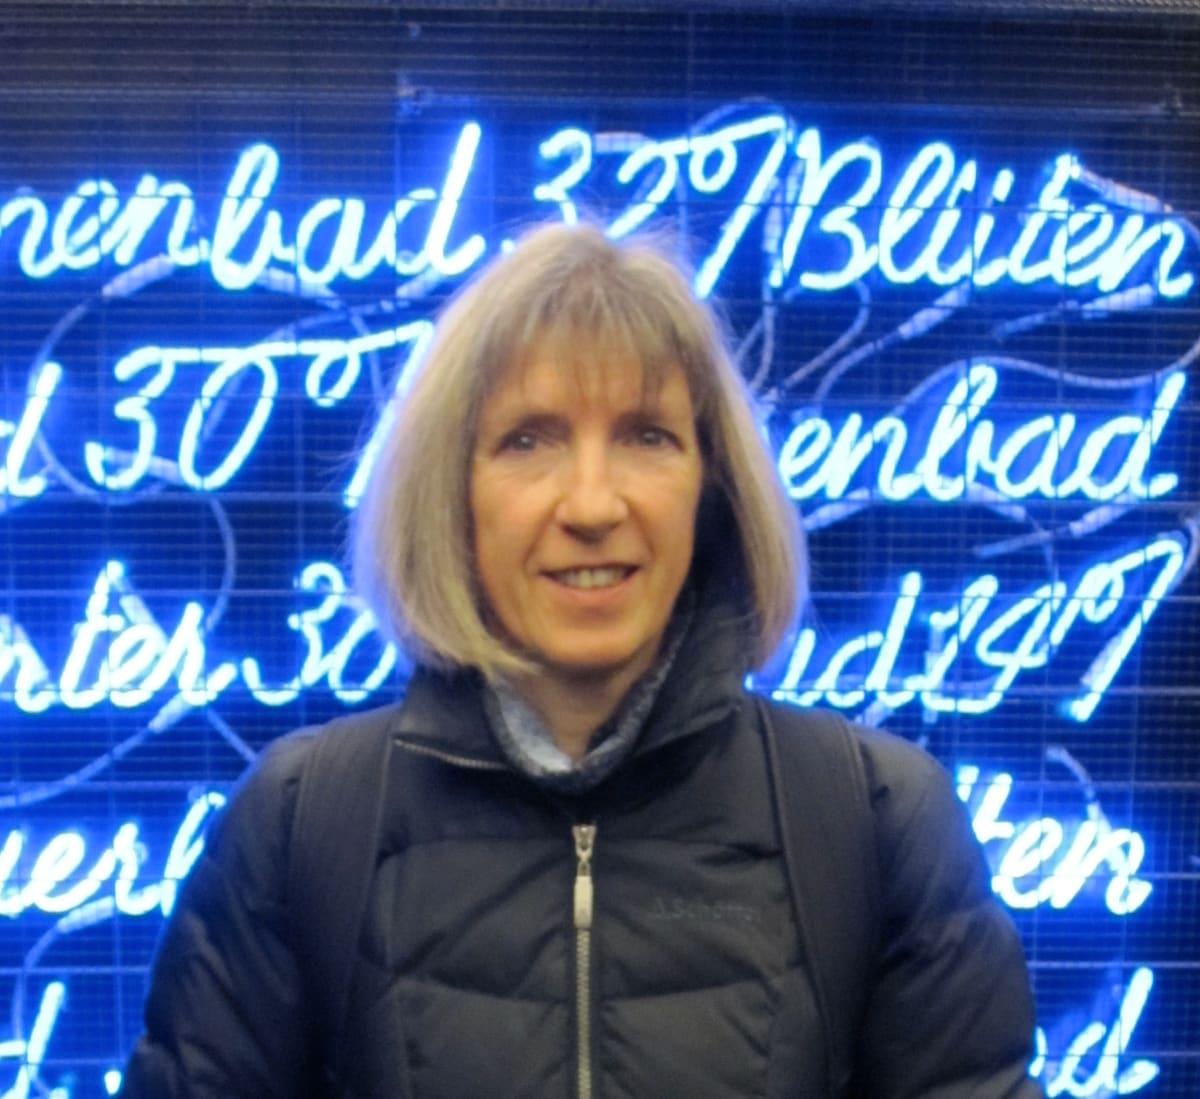 Barbara From Cornwall, United Kingdom